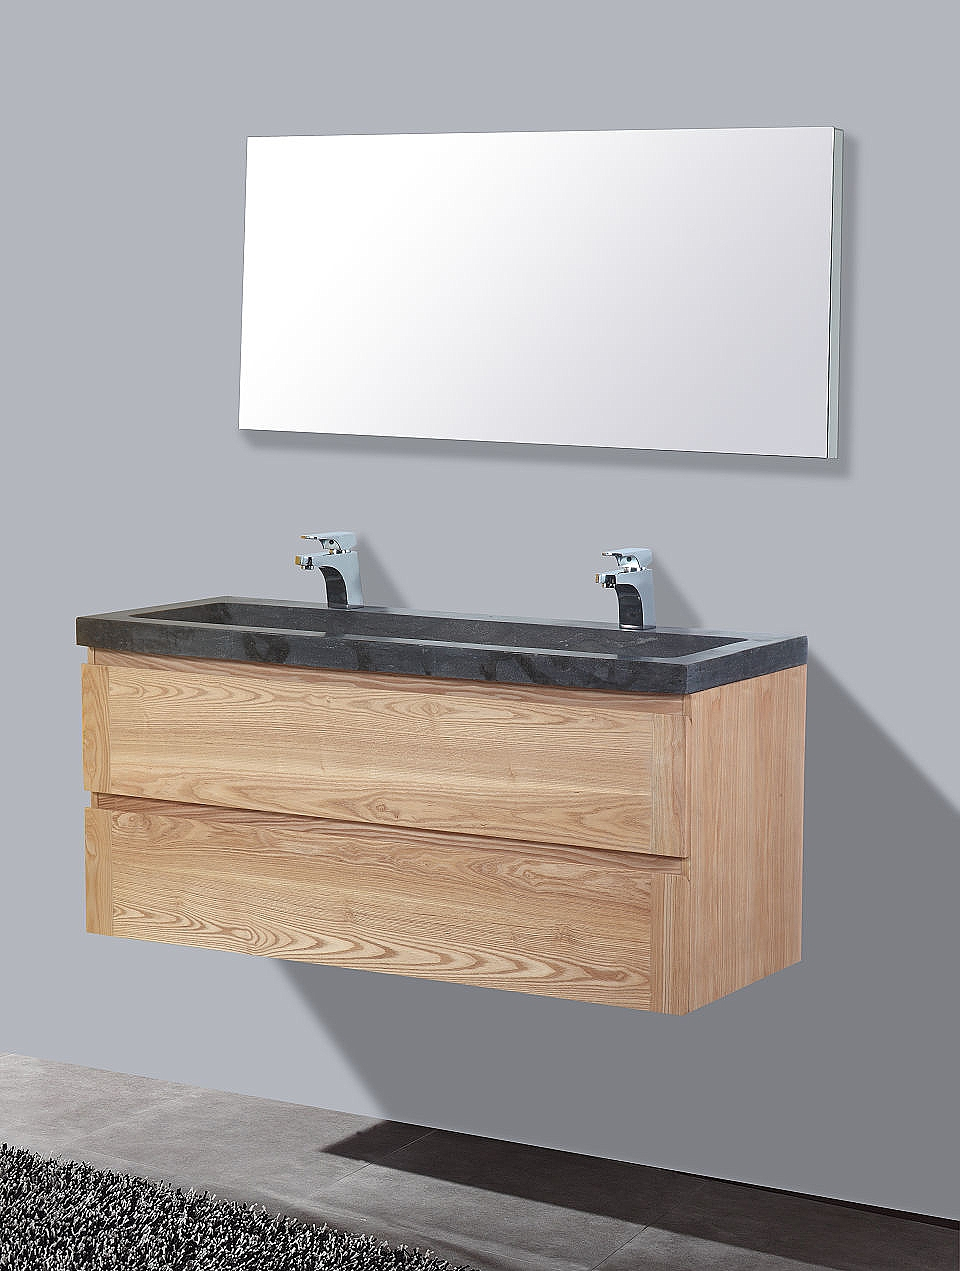 Frank&Co Wood Stone Badkamermeubel hout eiken/natuursteen 120cm ...